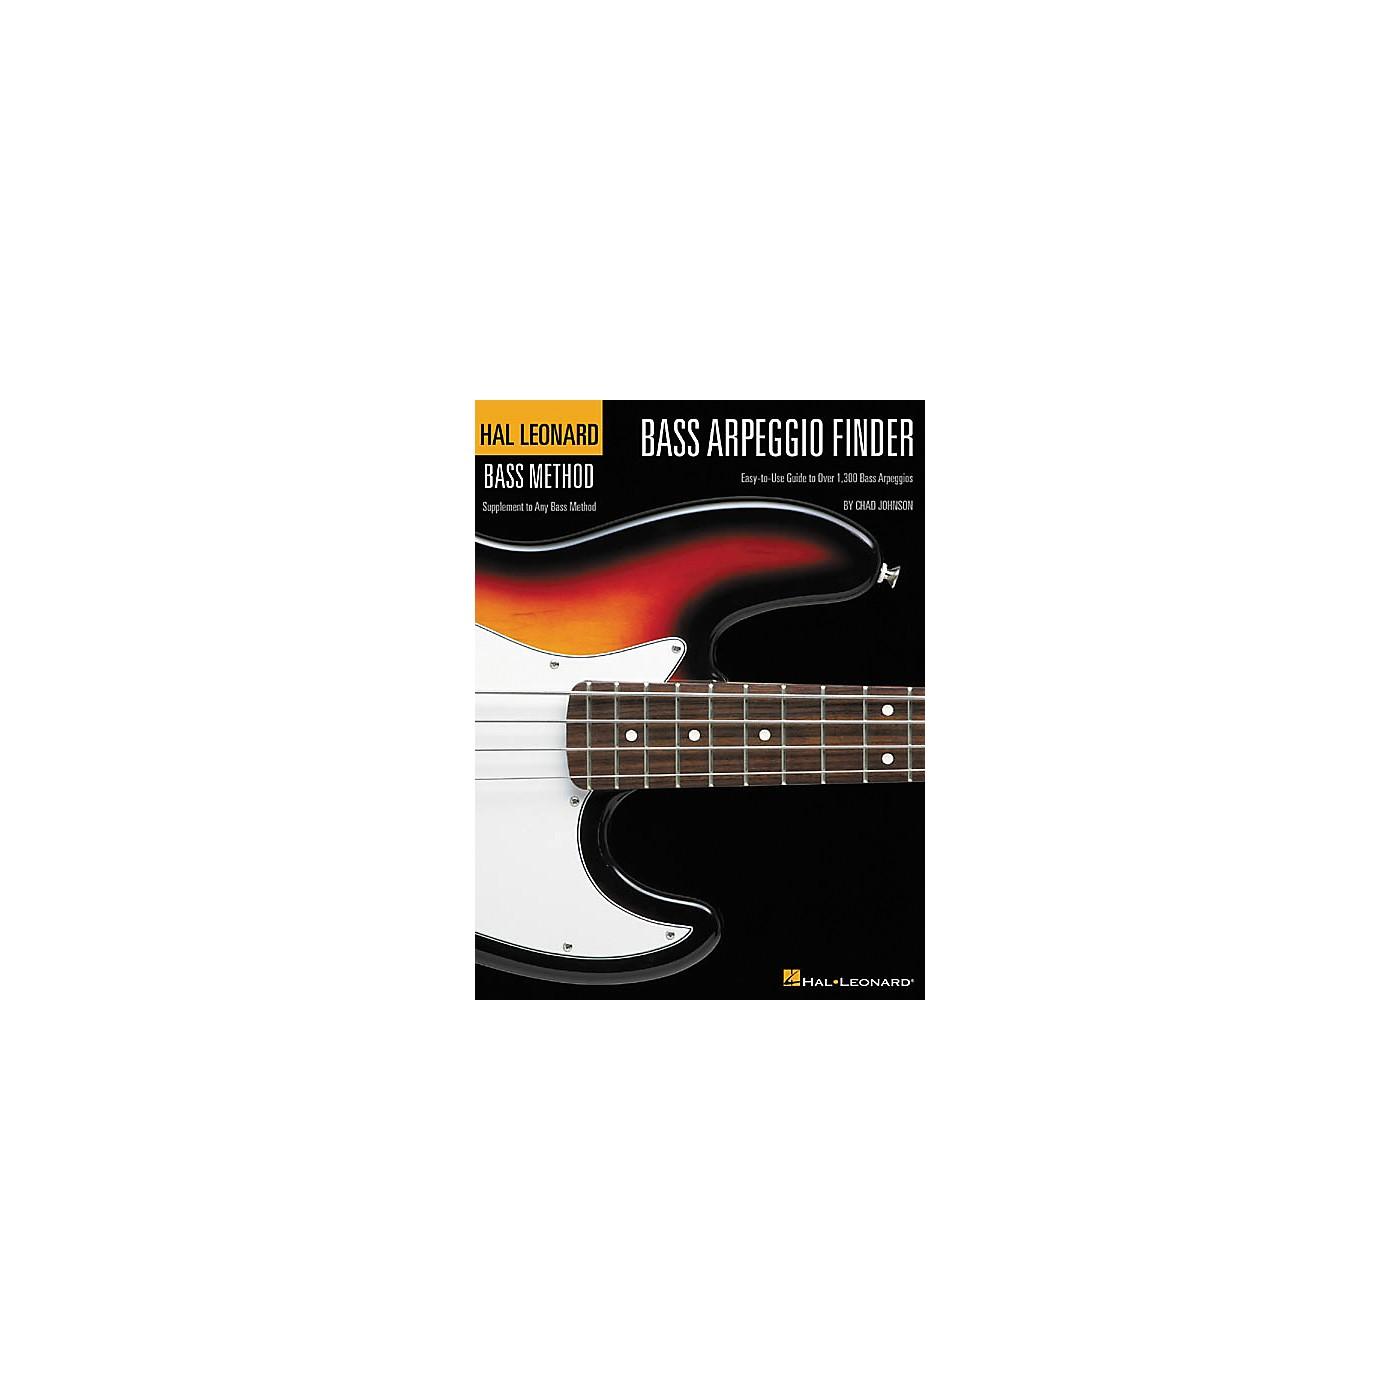 Hal Leonard Bass Arpeggio Finder by Chad Johnson Book thumbnail